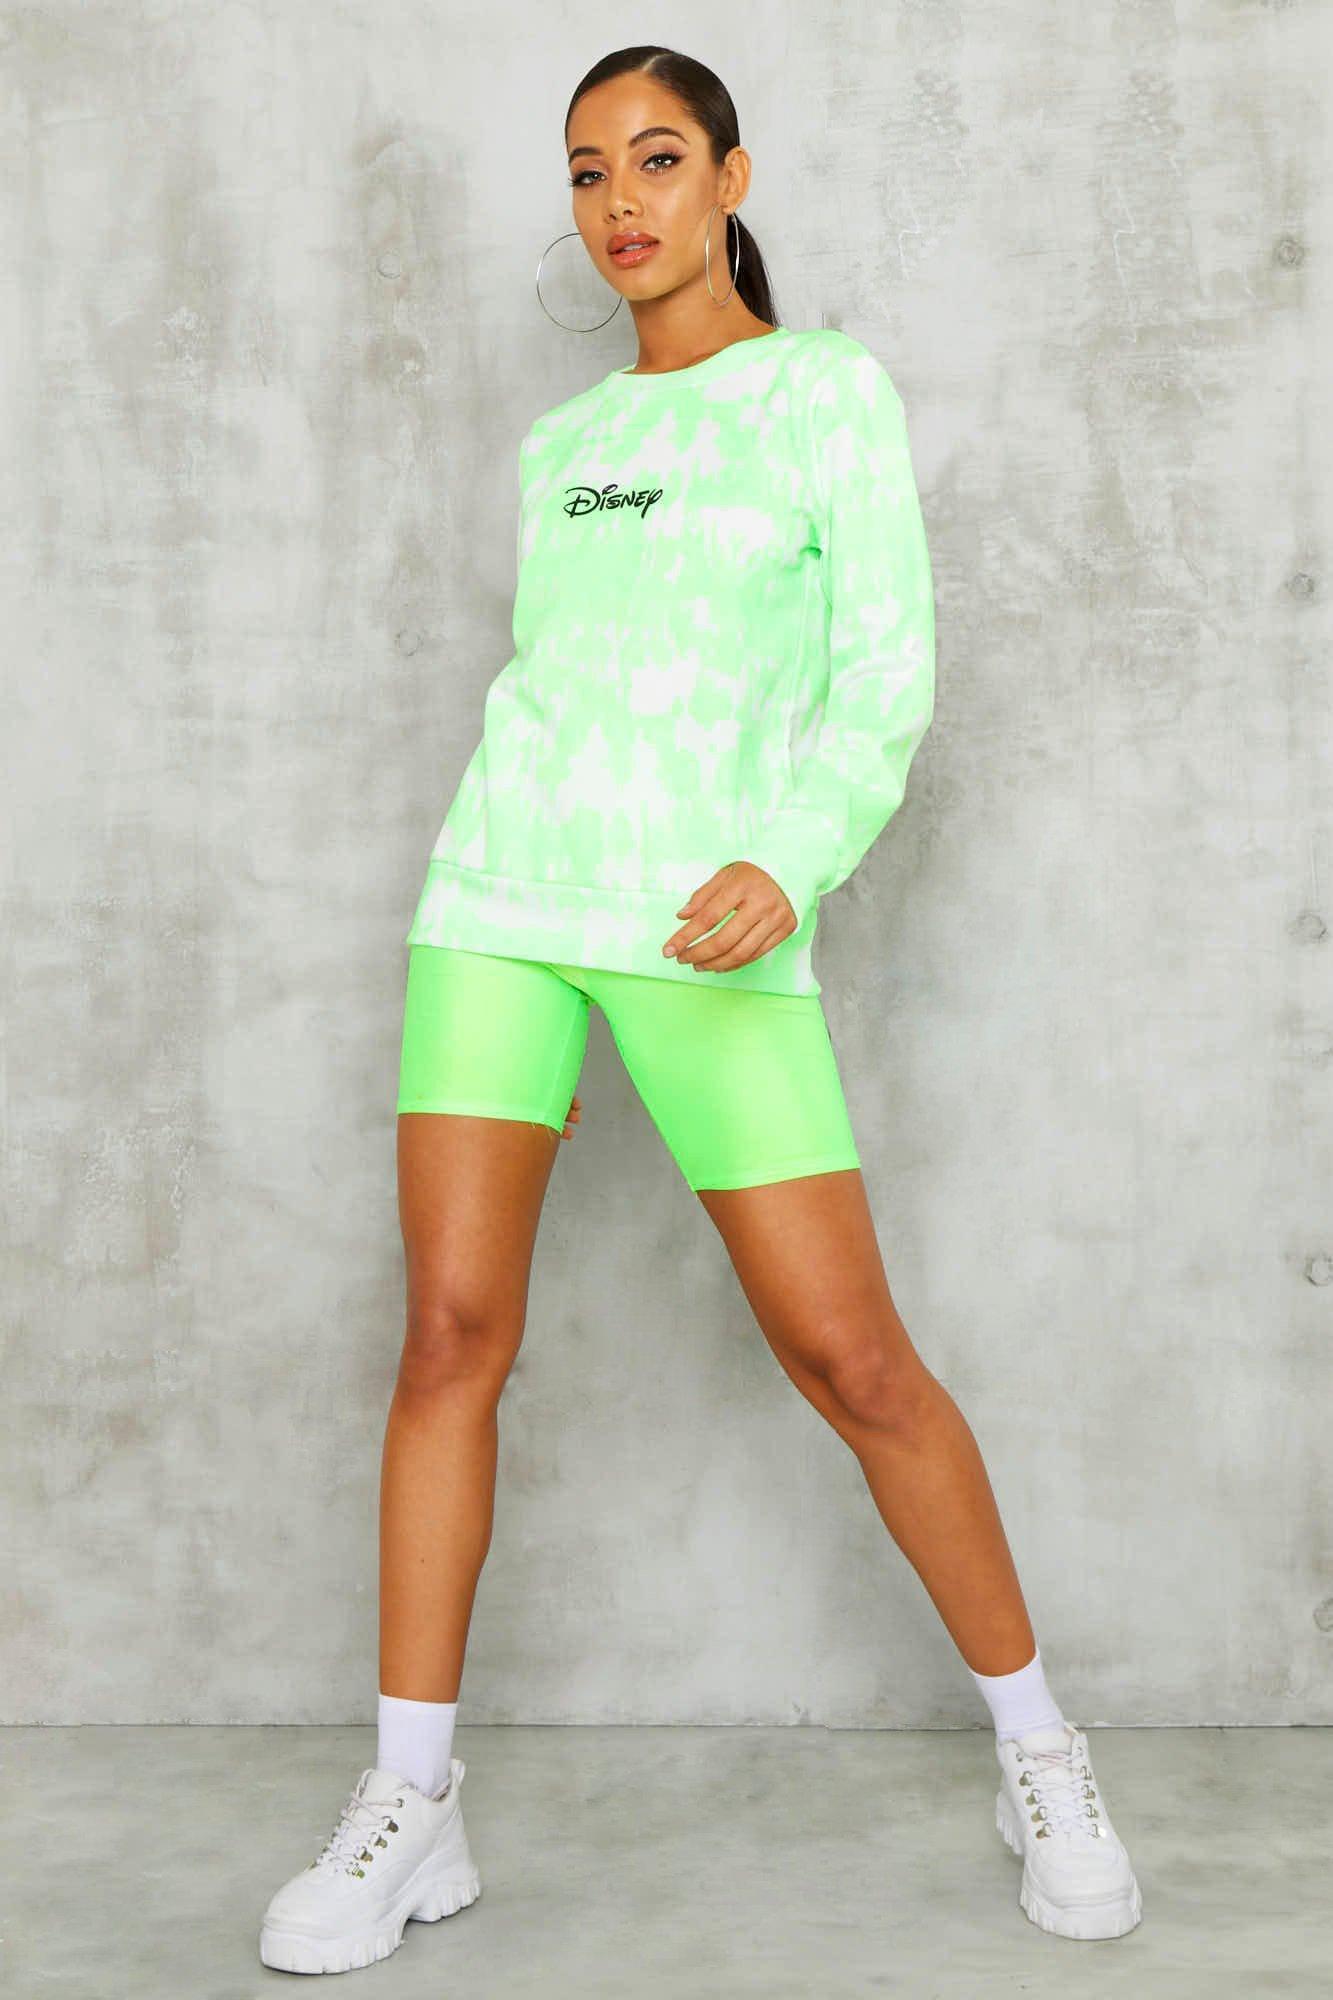 Womens Lizenziertes Disney Sweatshirt mit Print - Limettengrün - 32, Limettengrün - Boohoo.com